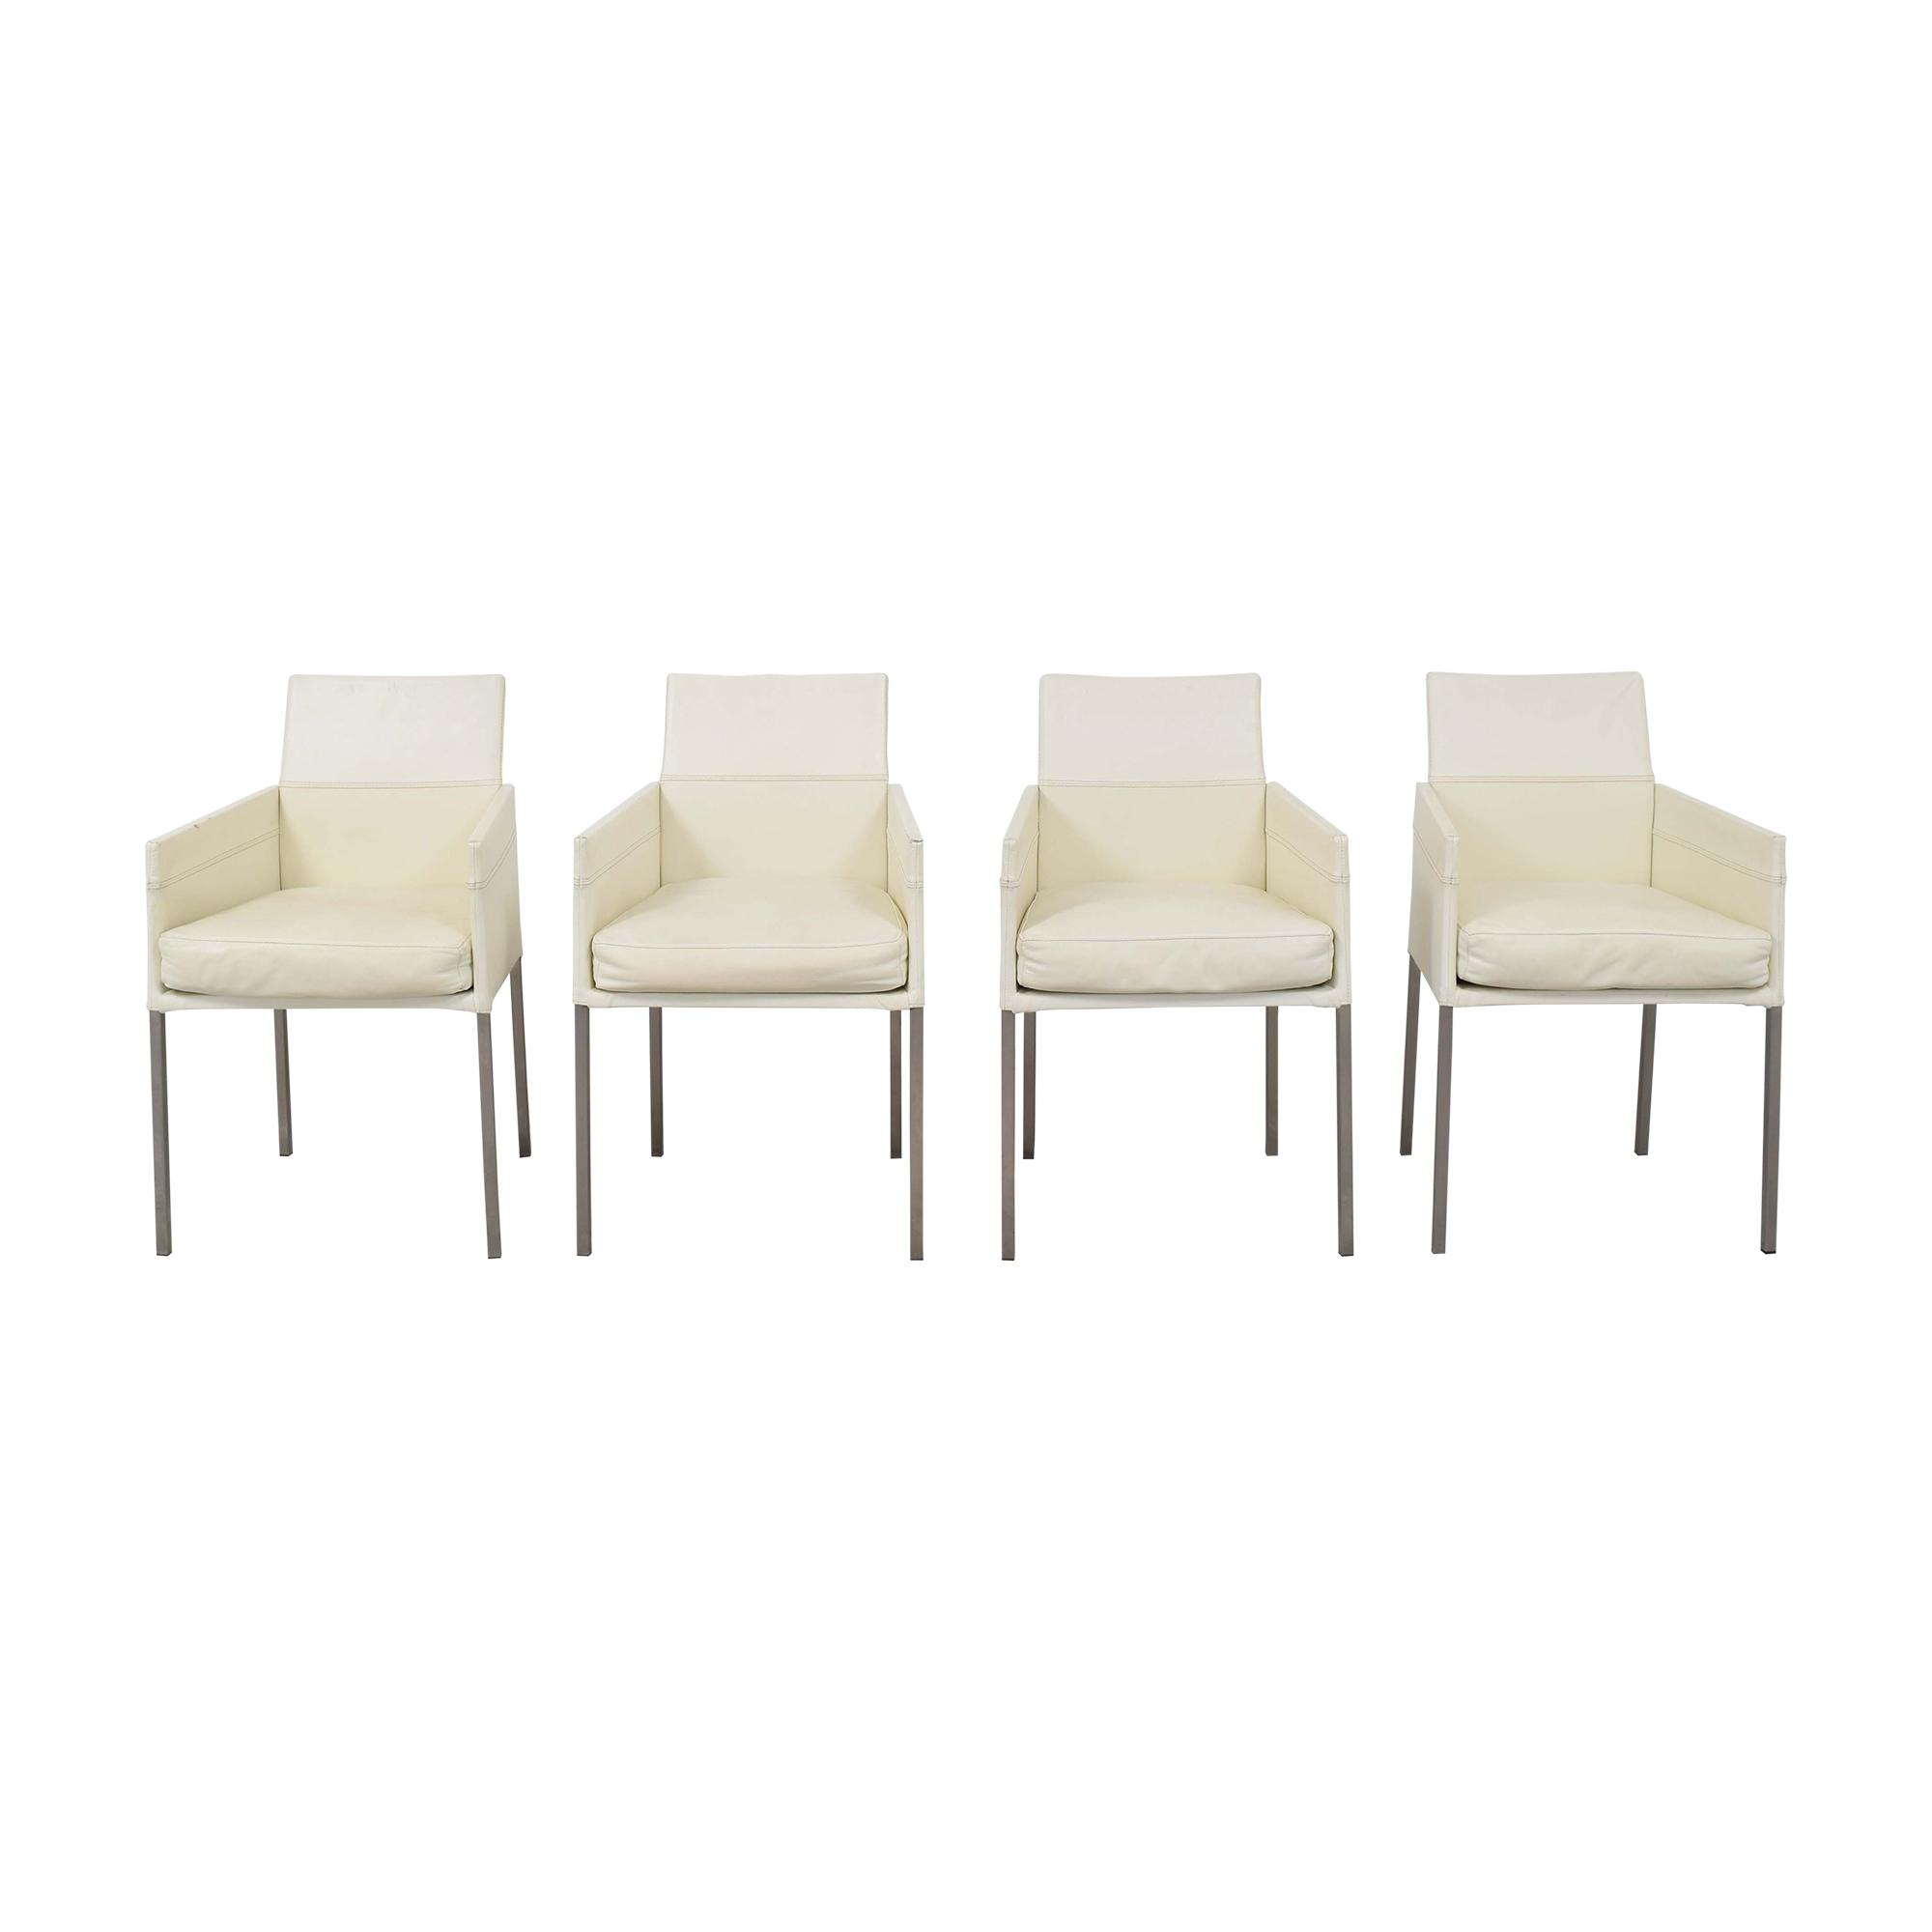 KFF Design KFF Texas Dining Arm Chairs on sale